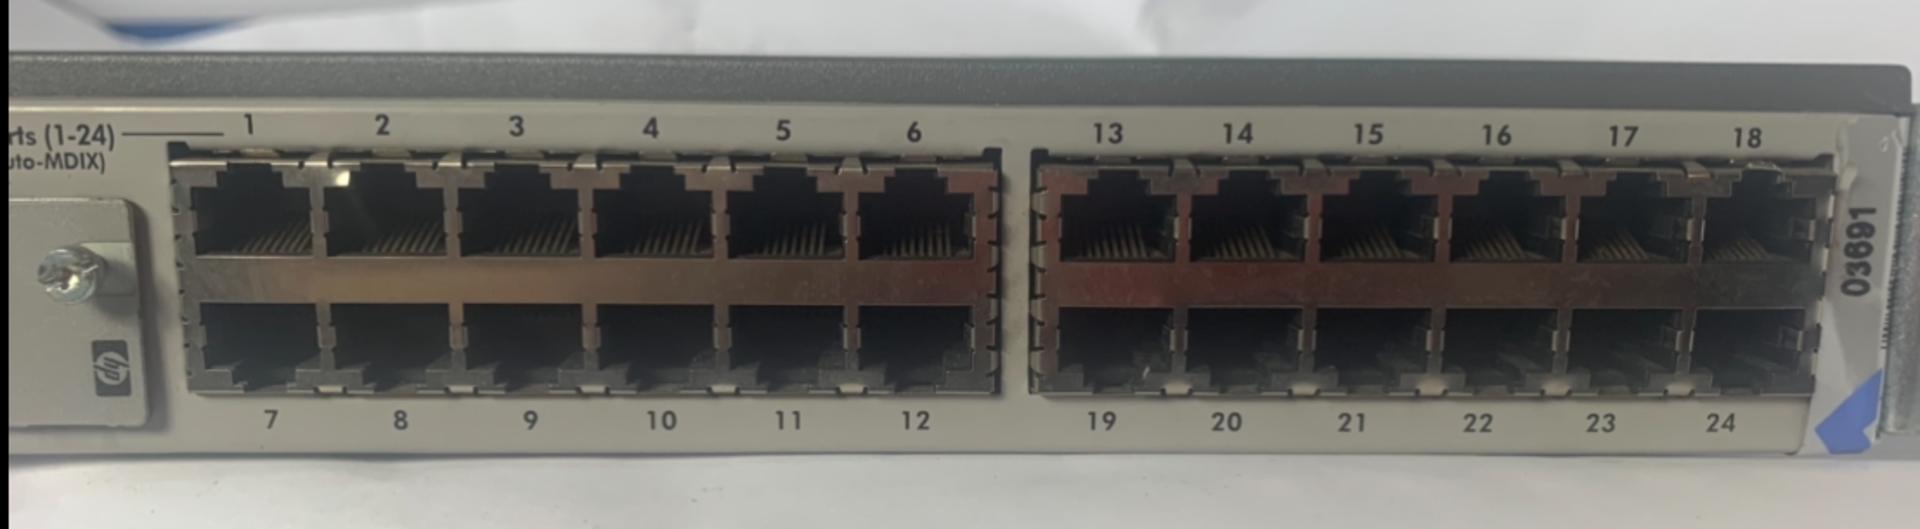 Lot 47 - HP J4818A Pro 24 Port Switch